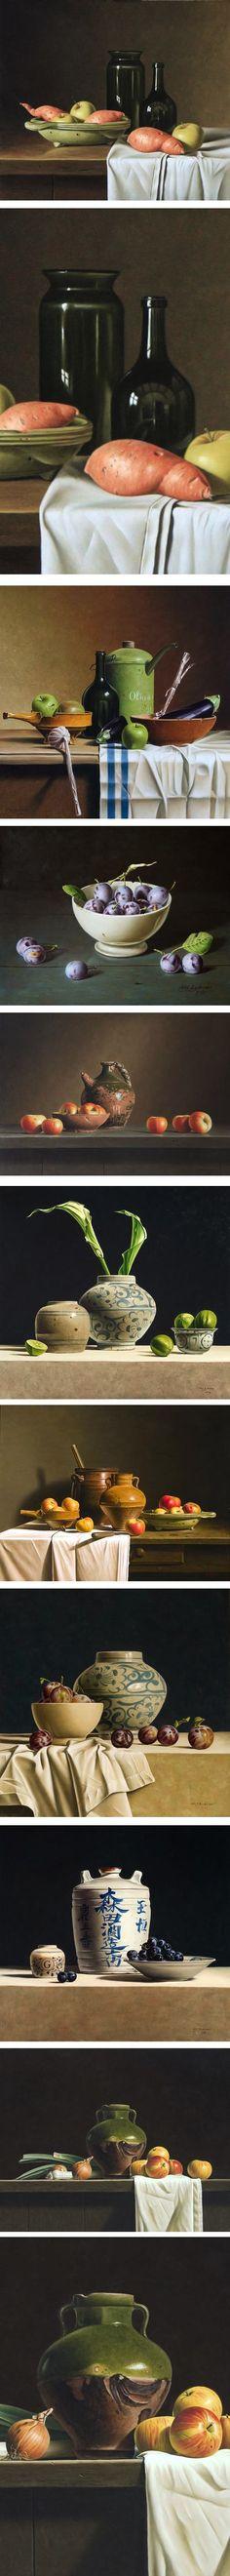 Stefaan Eyckmans http://es.pinterest.com/rheagpettit/art-hyperrealism/